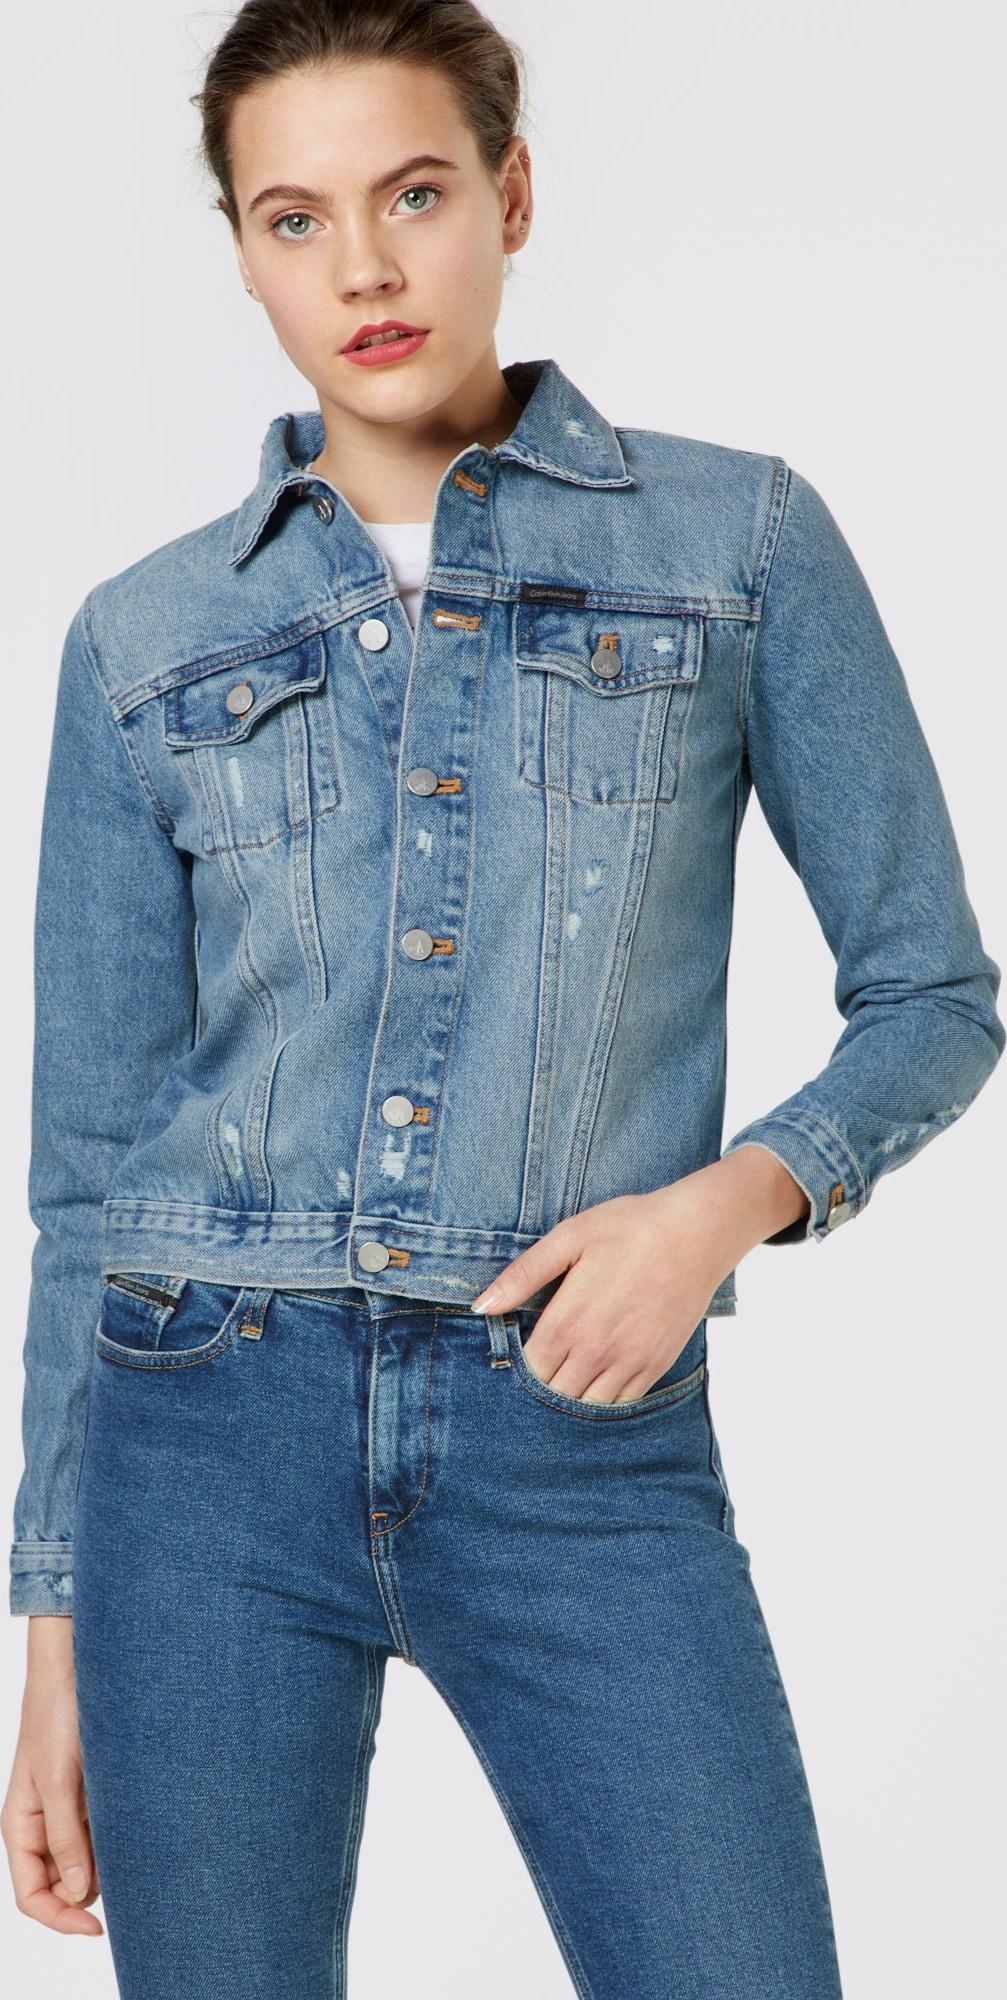 calvin klein jeans jeansjacke 39 clean line trucker vintage a 39 in blau about you. Black Bedroom Furniture Sets. Home Design Ideas